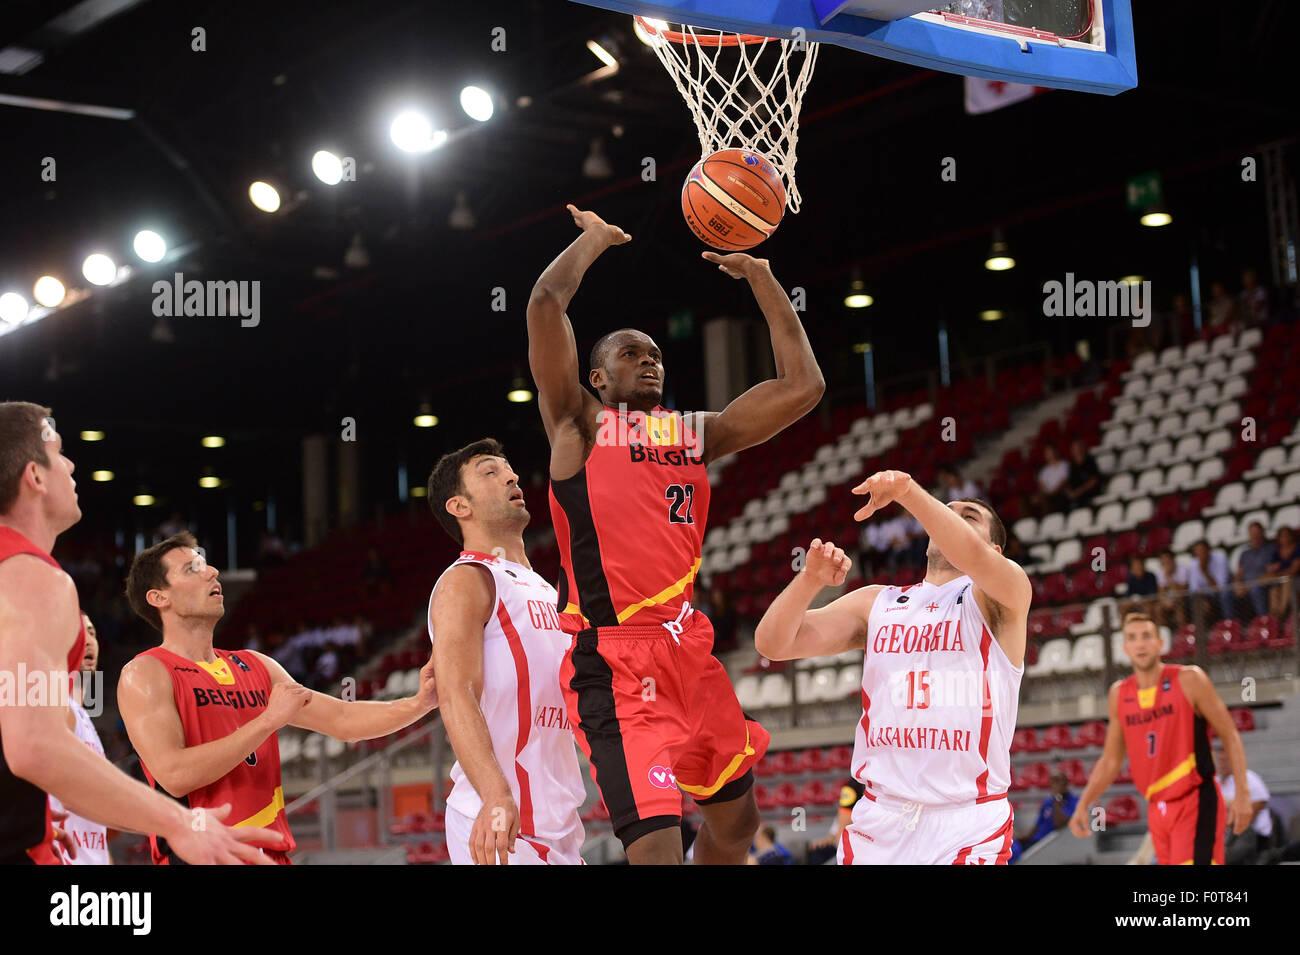 Paris, Frankreich. 20. August 2015. Internationale Basketball-Freundschaftsspiel. Belgien vs. Georgien. Kevin Tumba Stockbild